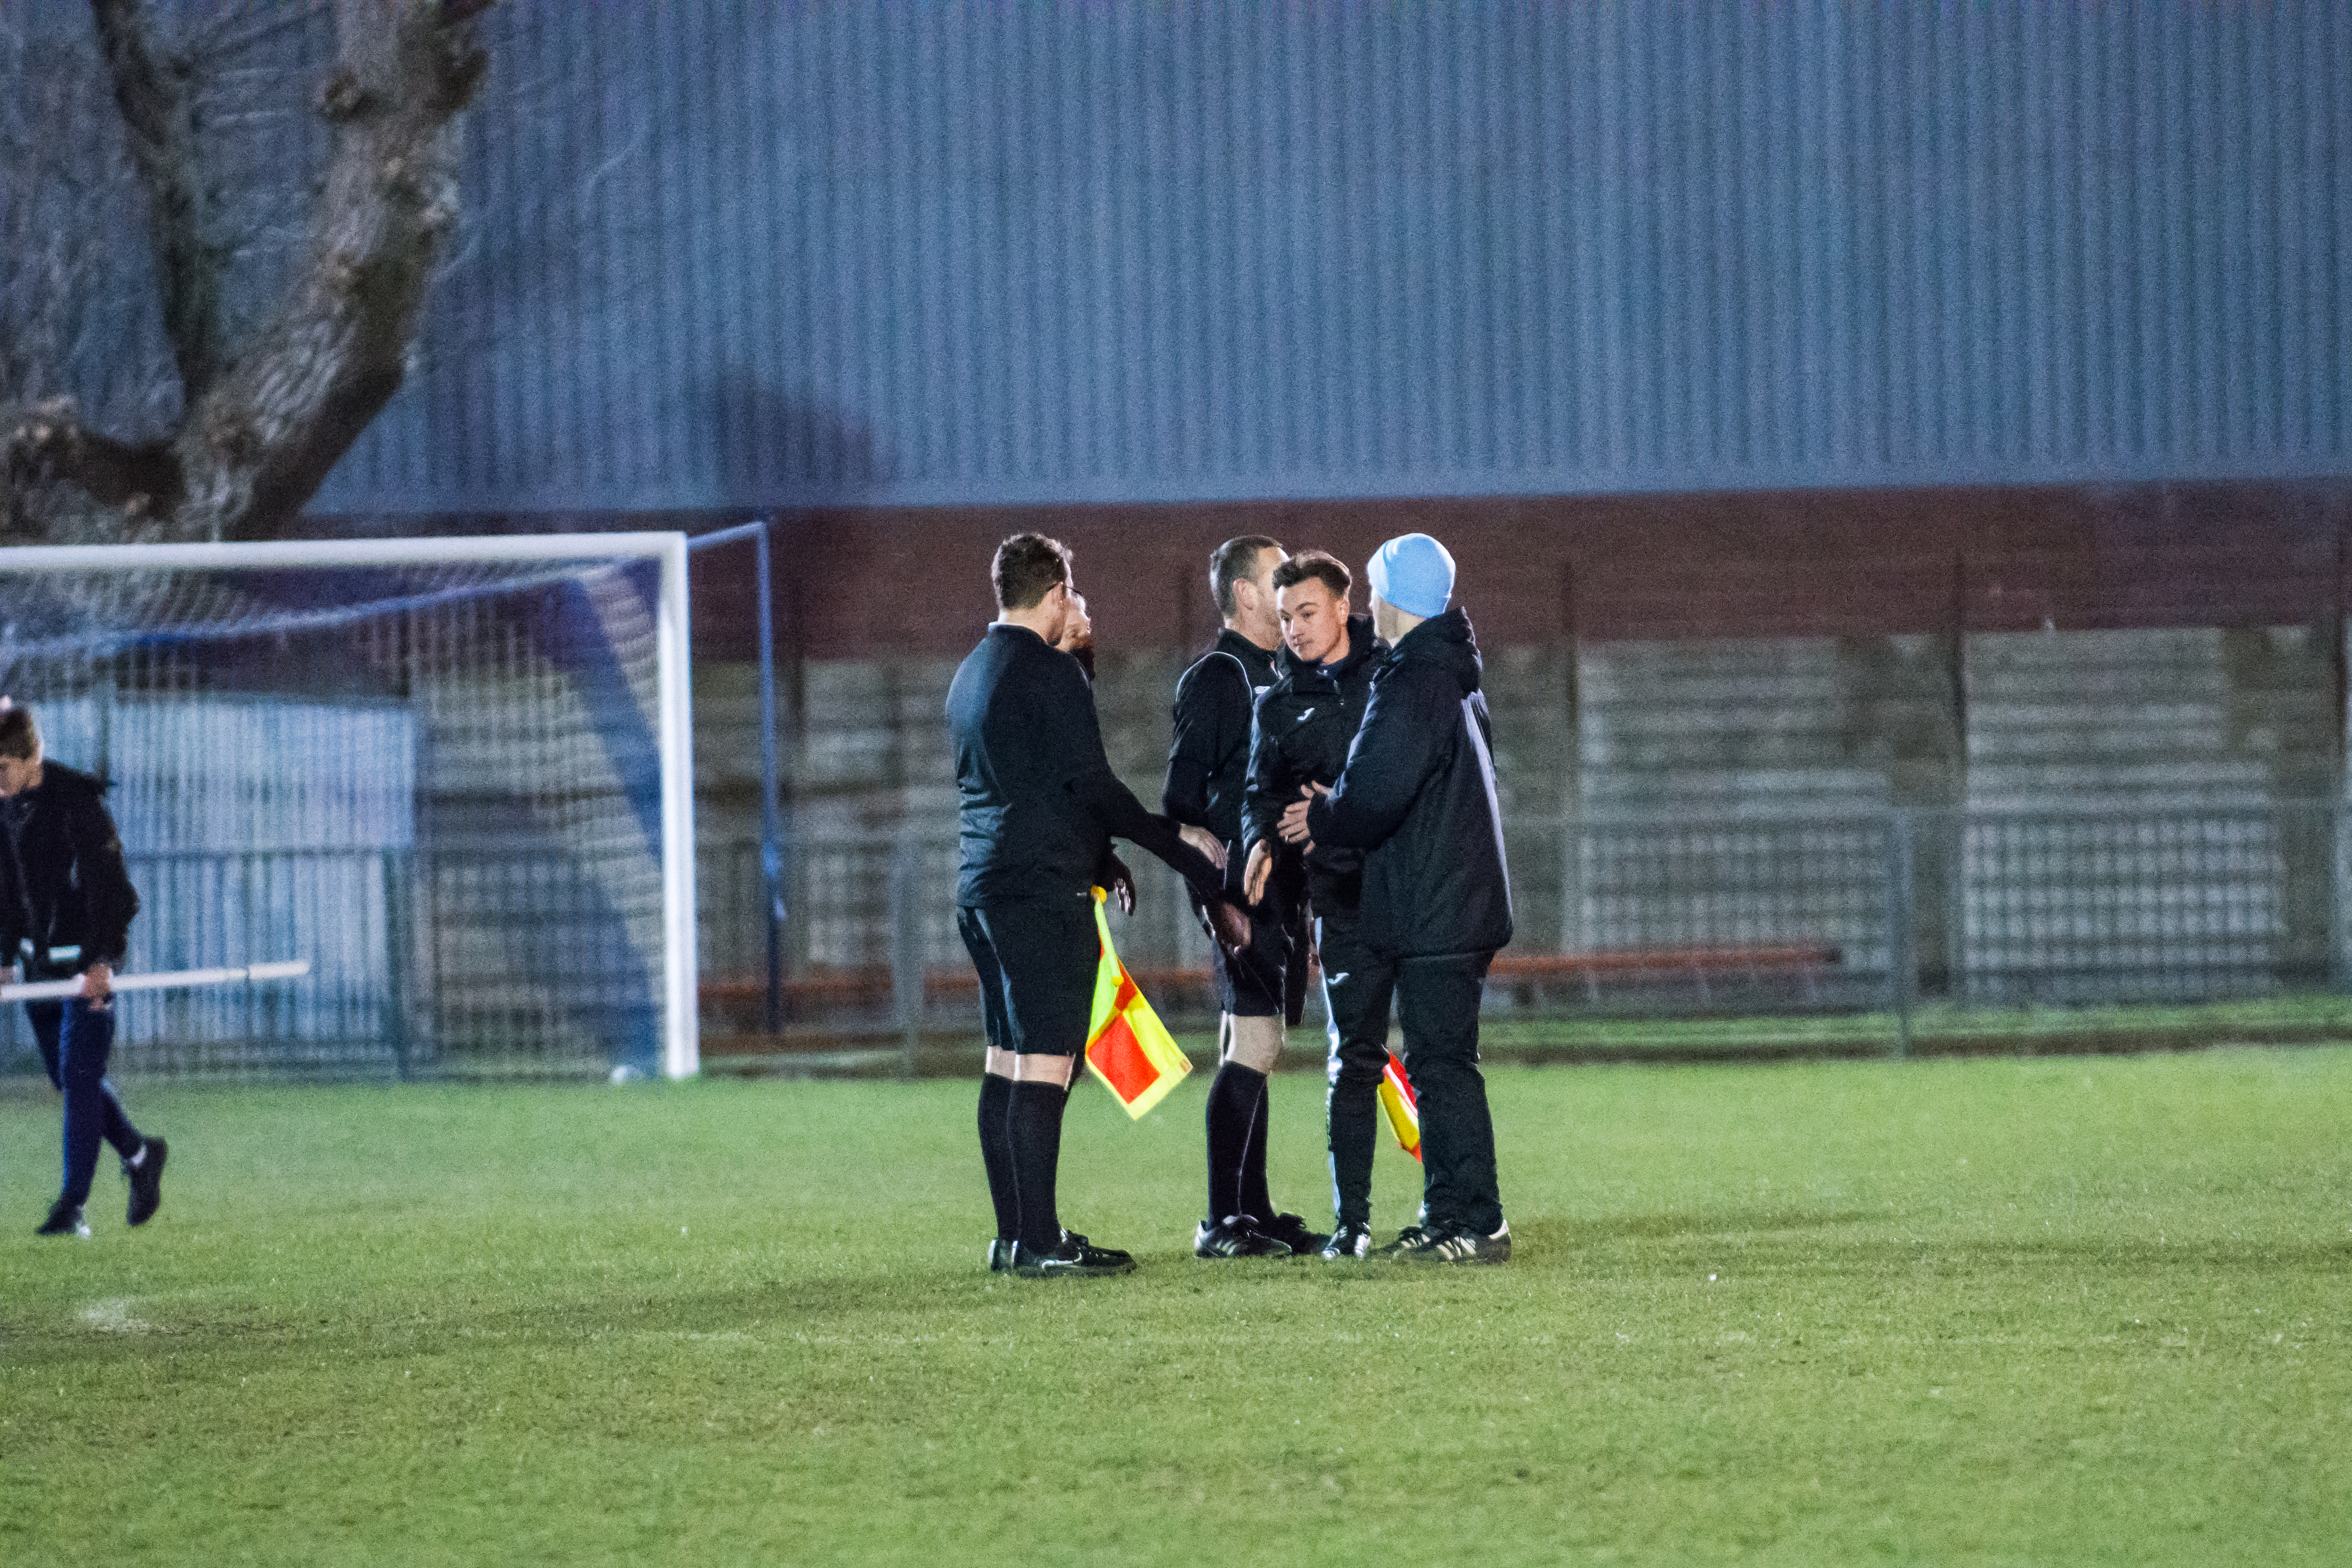 DAVID_JEFFERY Shoreham FC U18s vs Woking FC Academy 22.03.18 99